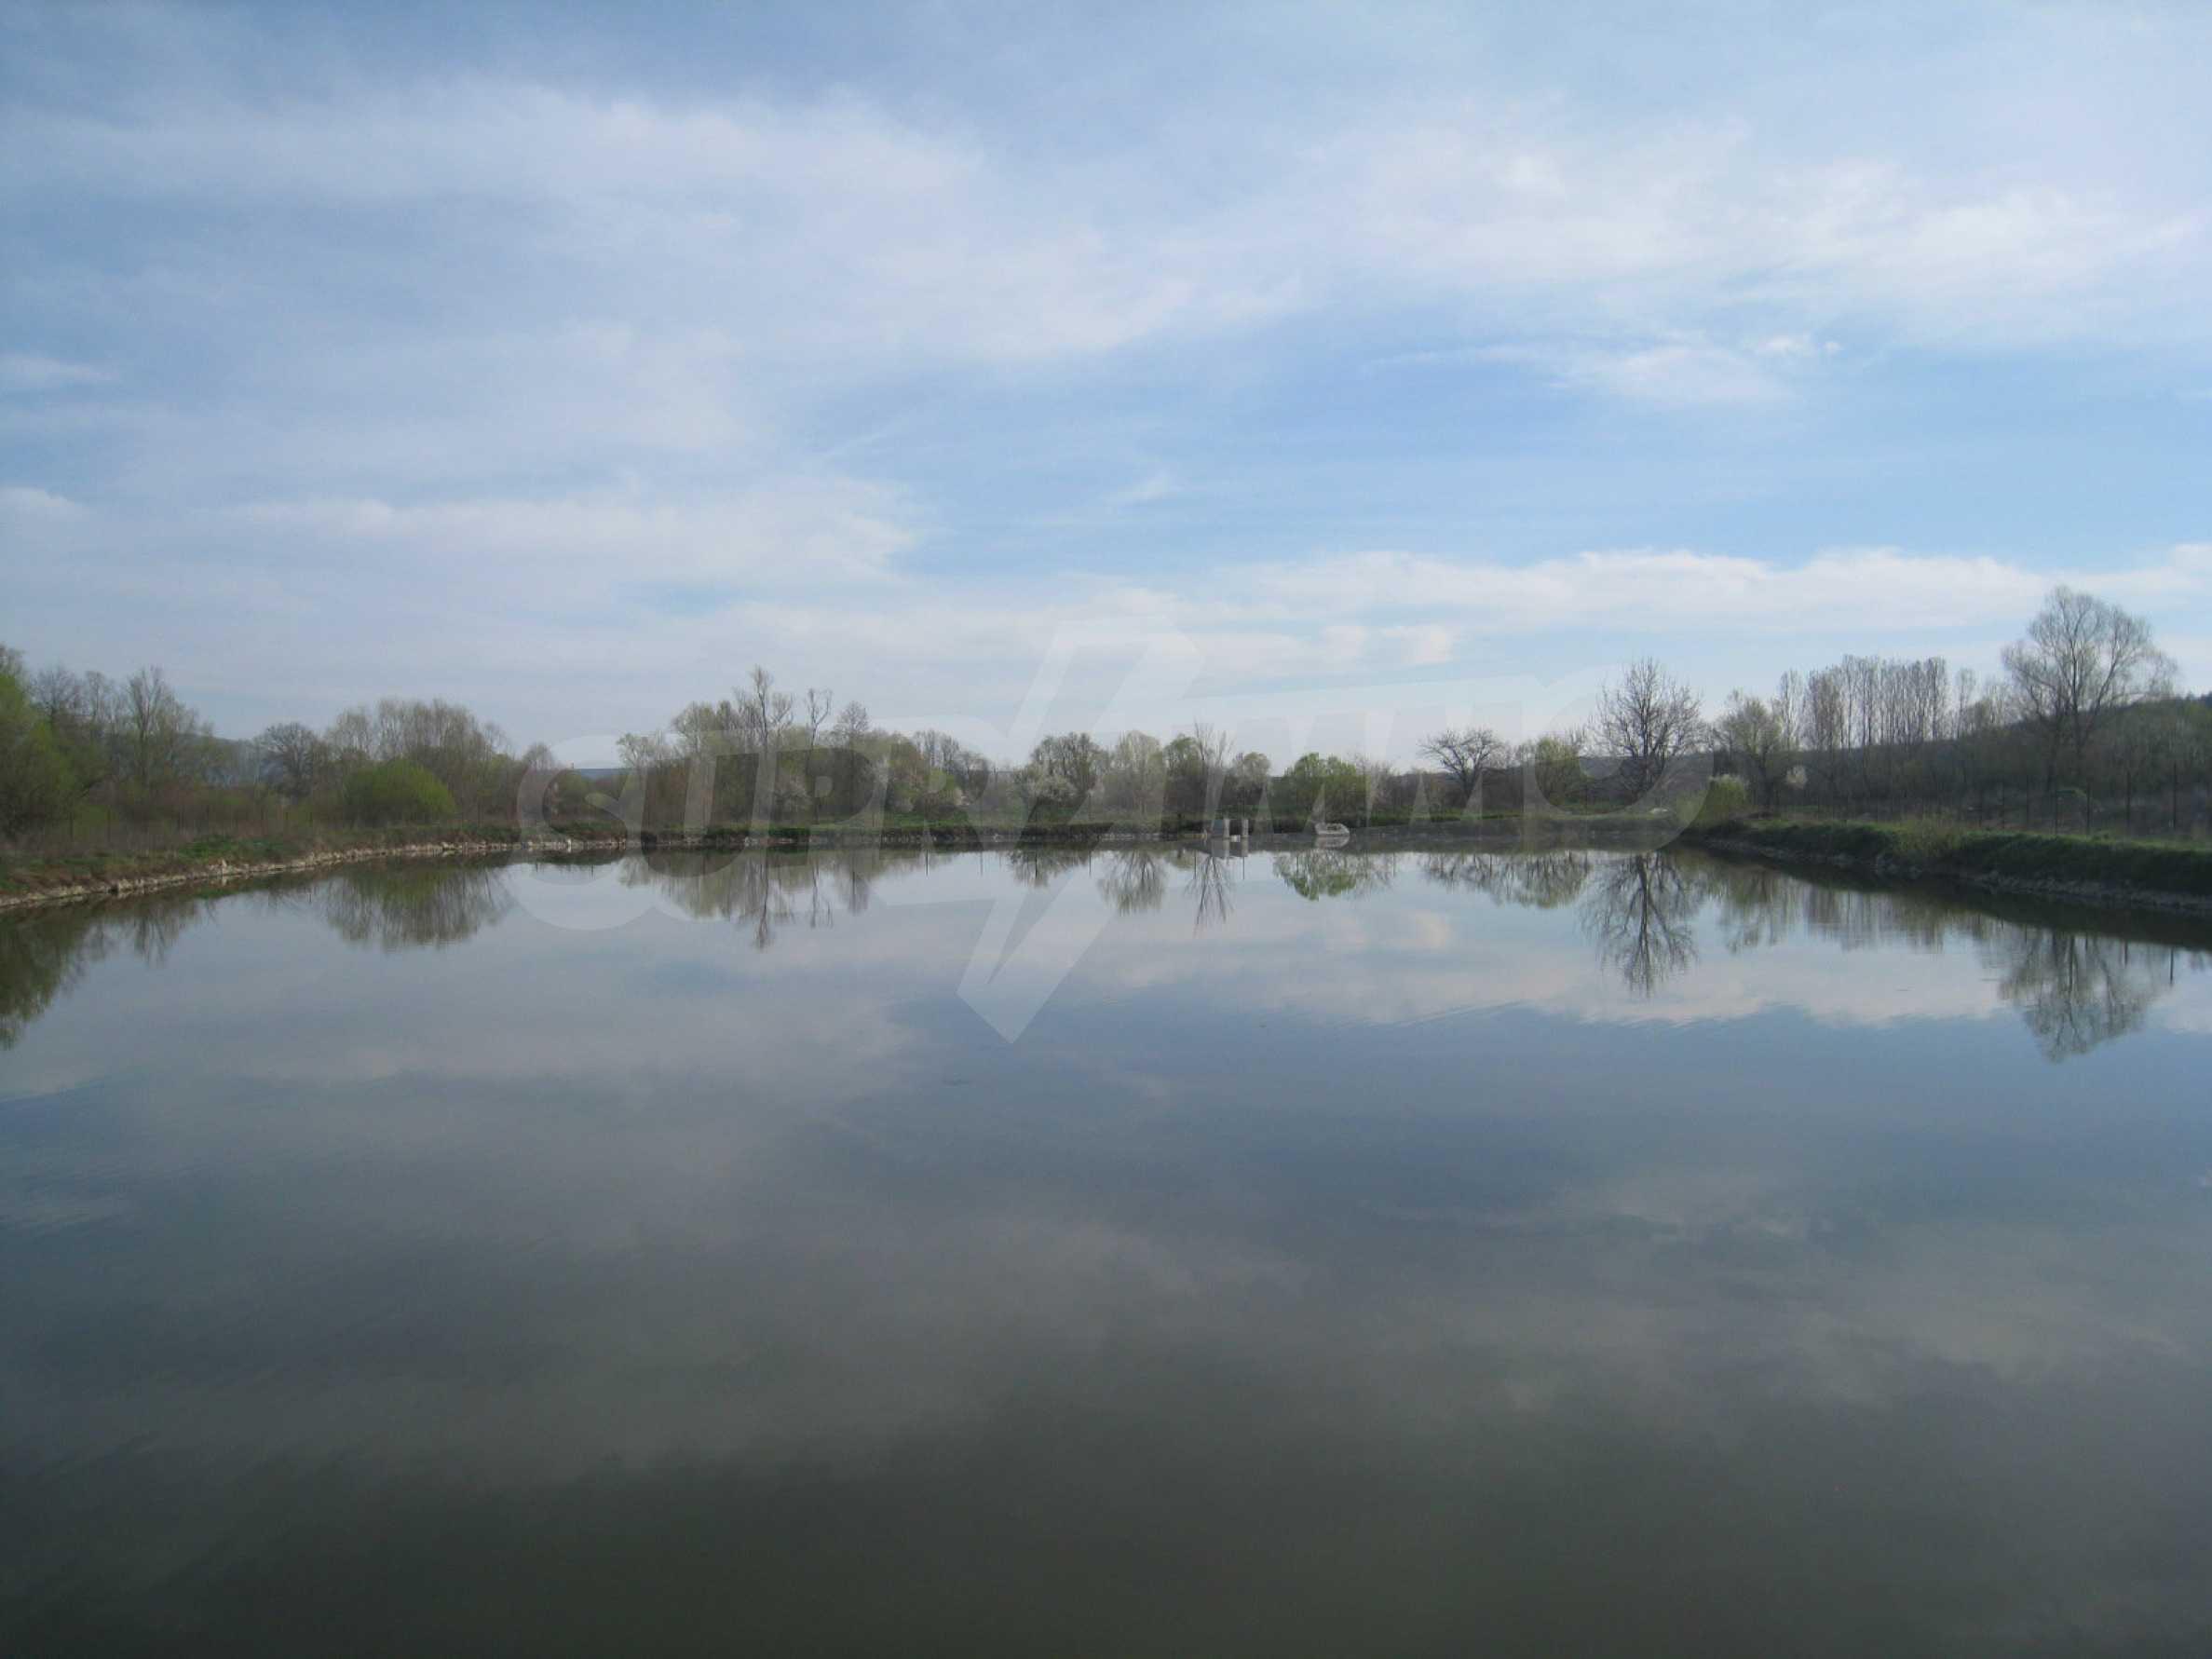 Fishpond, warehouses, residential areas and asphalt ground near Montana 24